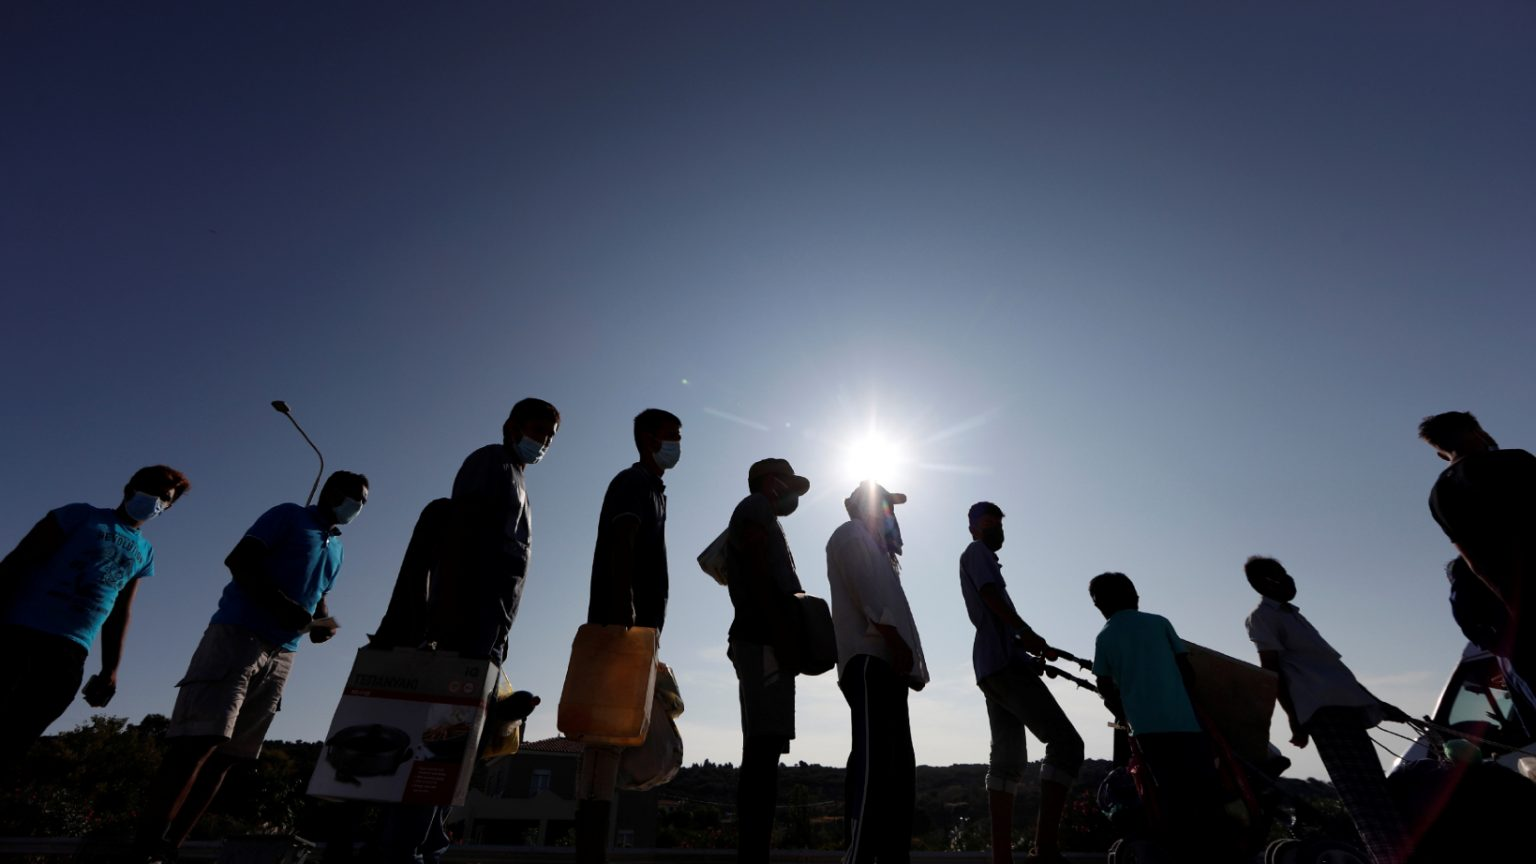 migrantes-refugiados-campo-lesbo-grécia_yara-nardi-reuters-1536x864.jpg